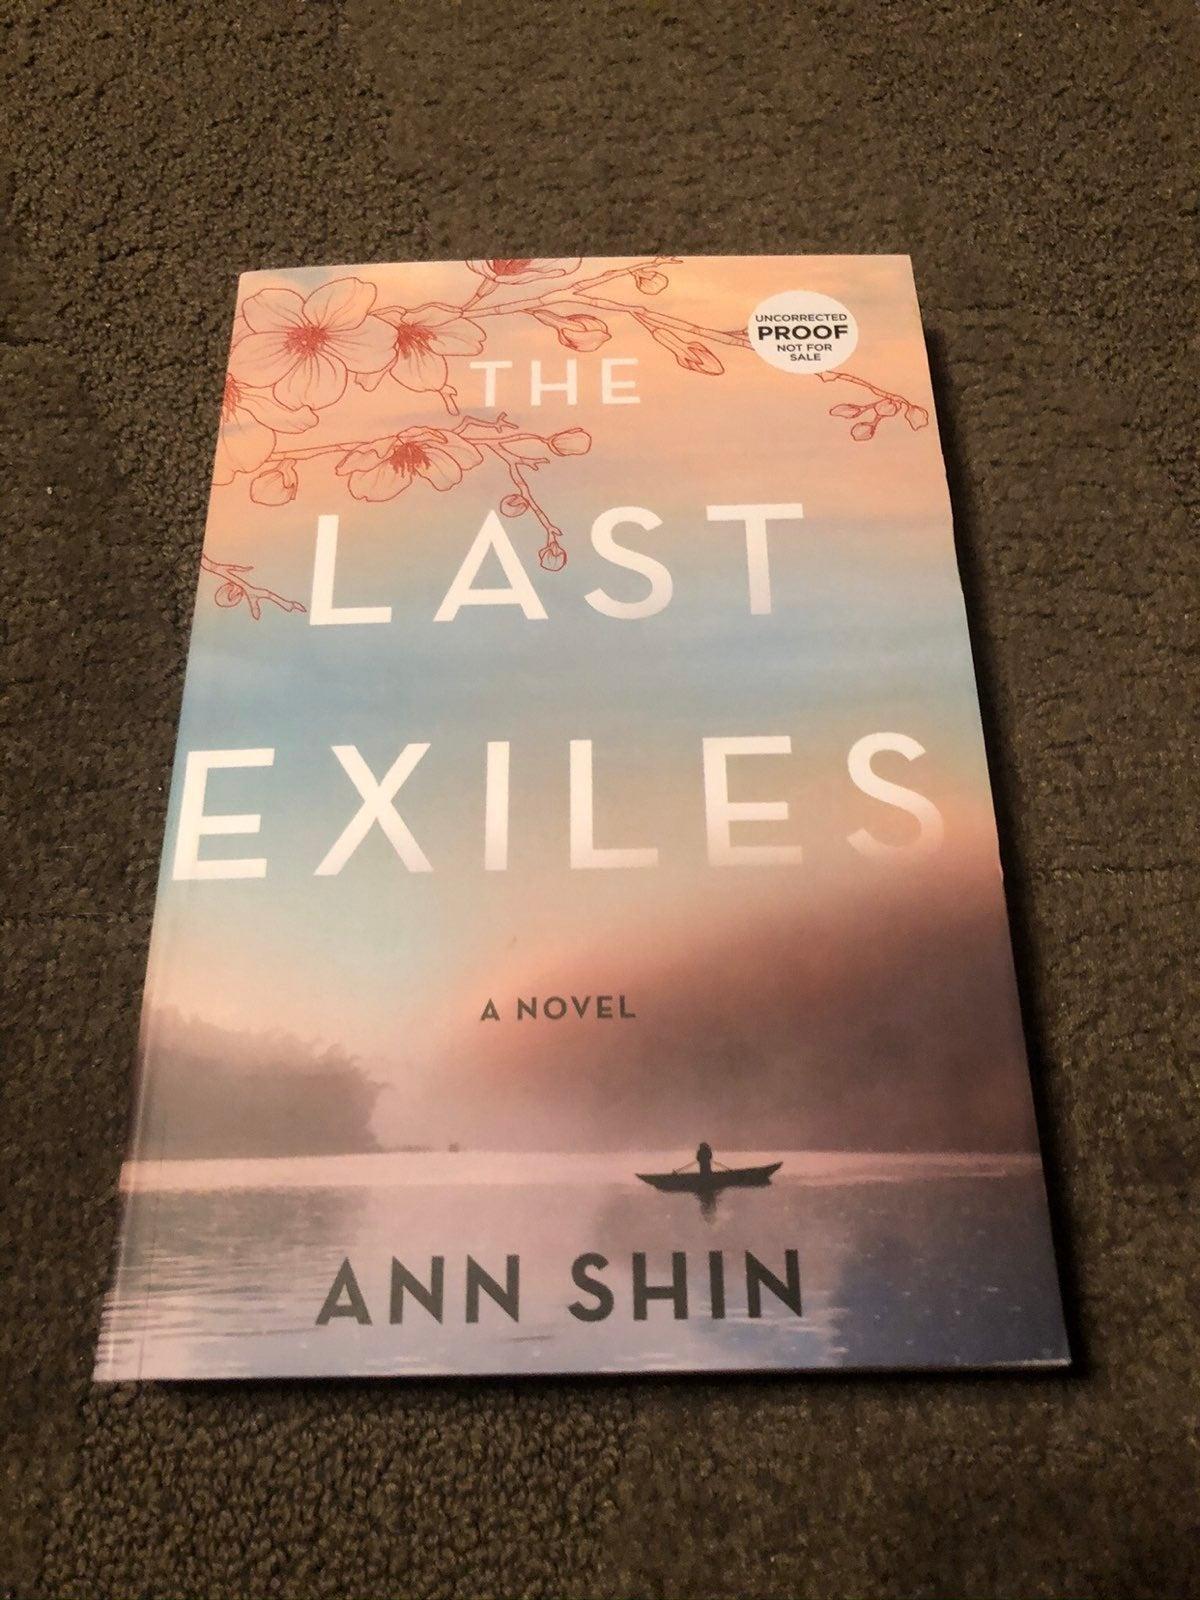 The Last Exiles by Ann Shin ARC